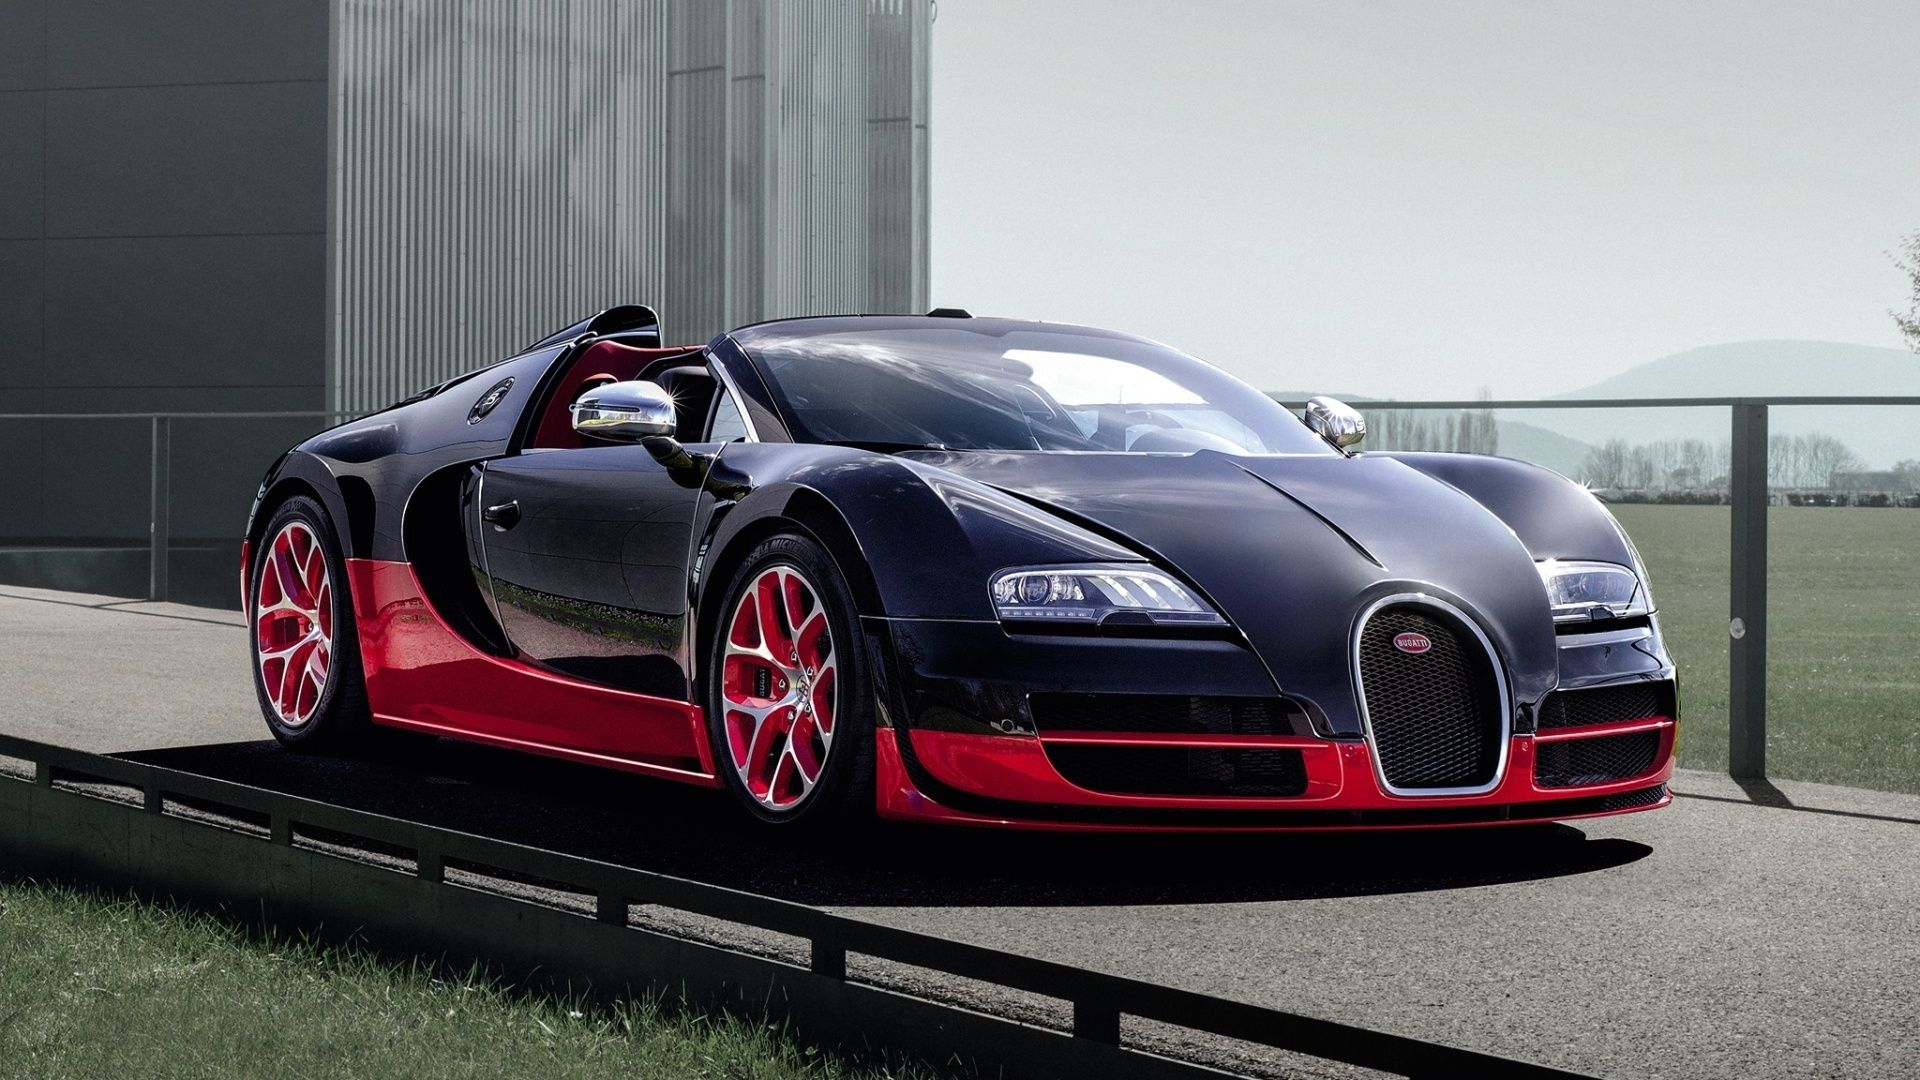 Pin De Richard Boodhoo En H E R M E S Bugatti Veyron Bugatti Coches Deportivos